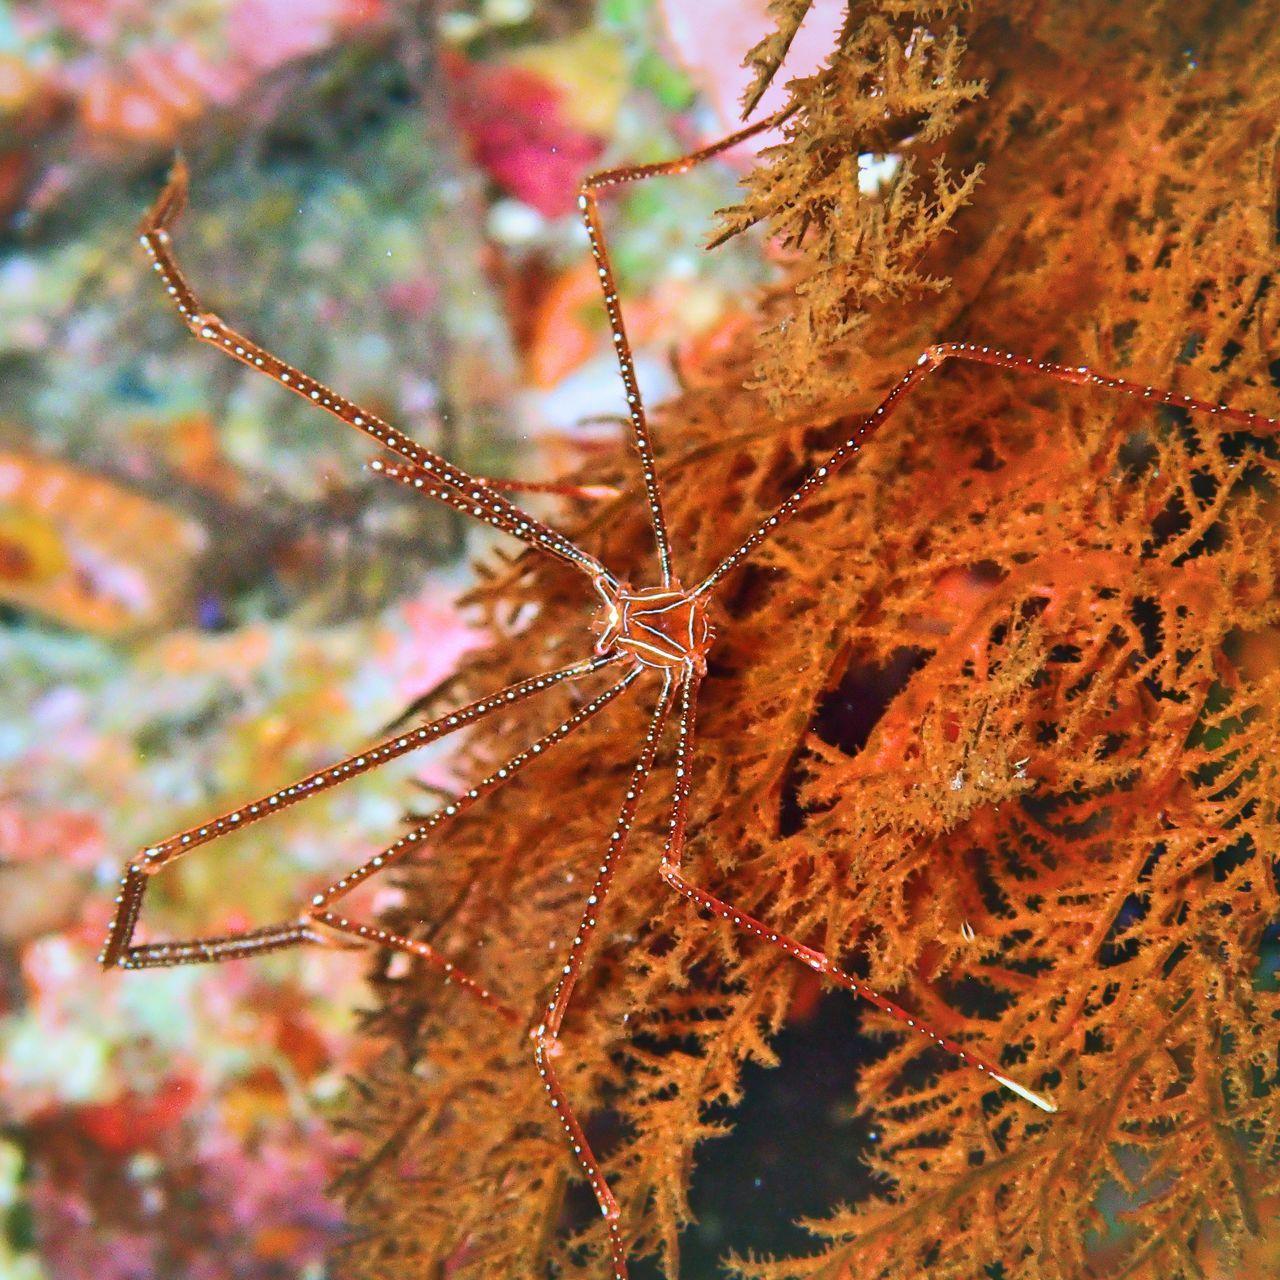 Close-up Diver Scuba Diving Sea And Sea Dive Macro Okinawa Ikelitehousing Underwaterphotography Canonphotography Ocean Diving Chirostylus Squat Lobster Padi OKINAWA, JAPAN Kerama Islands Kuroshima